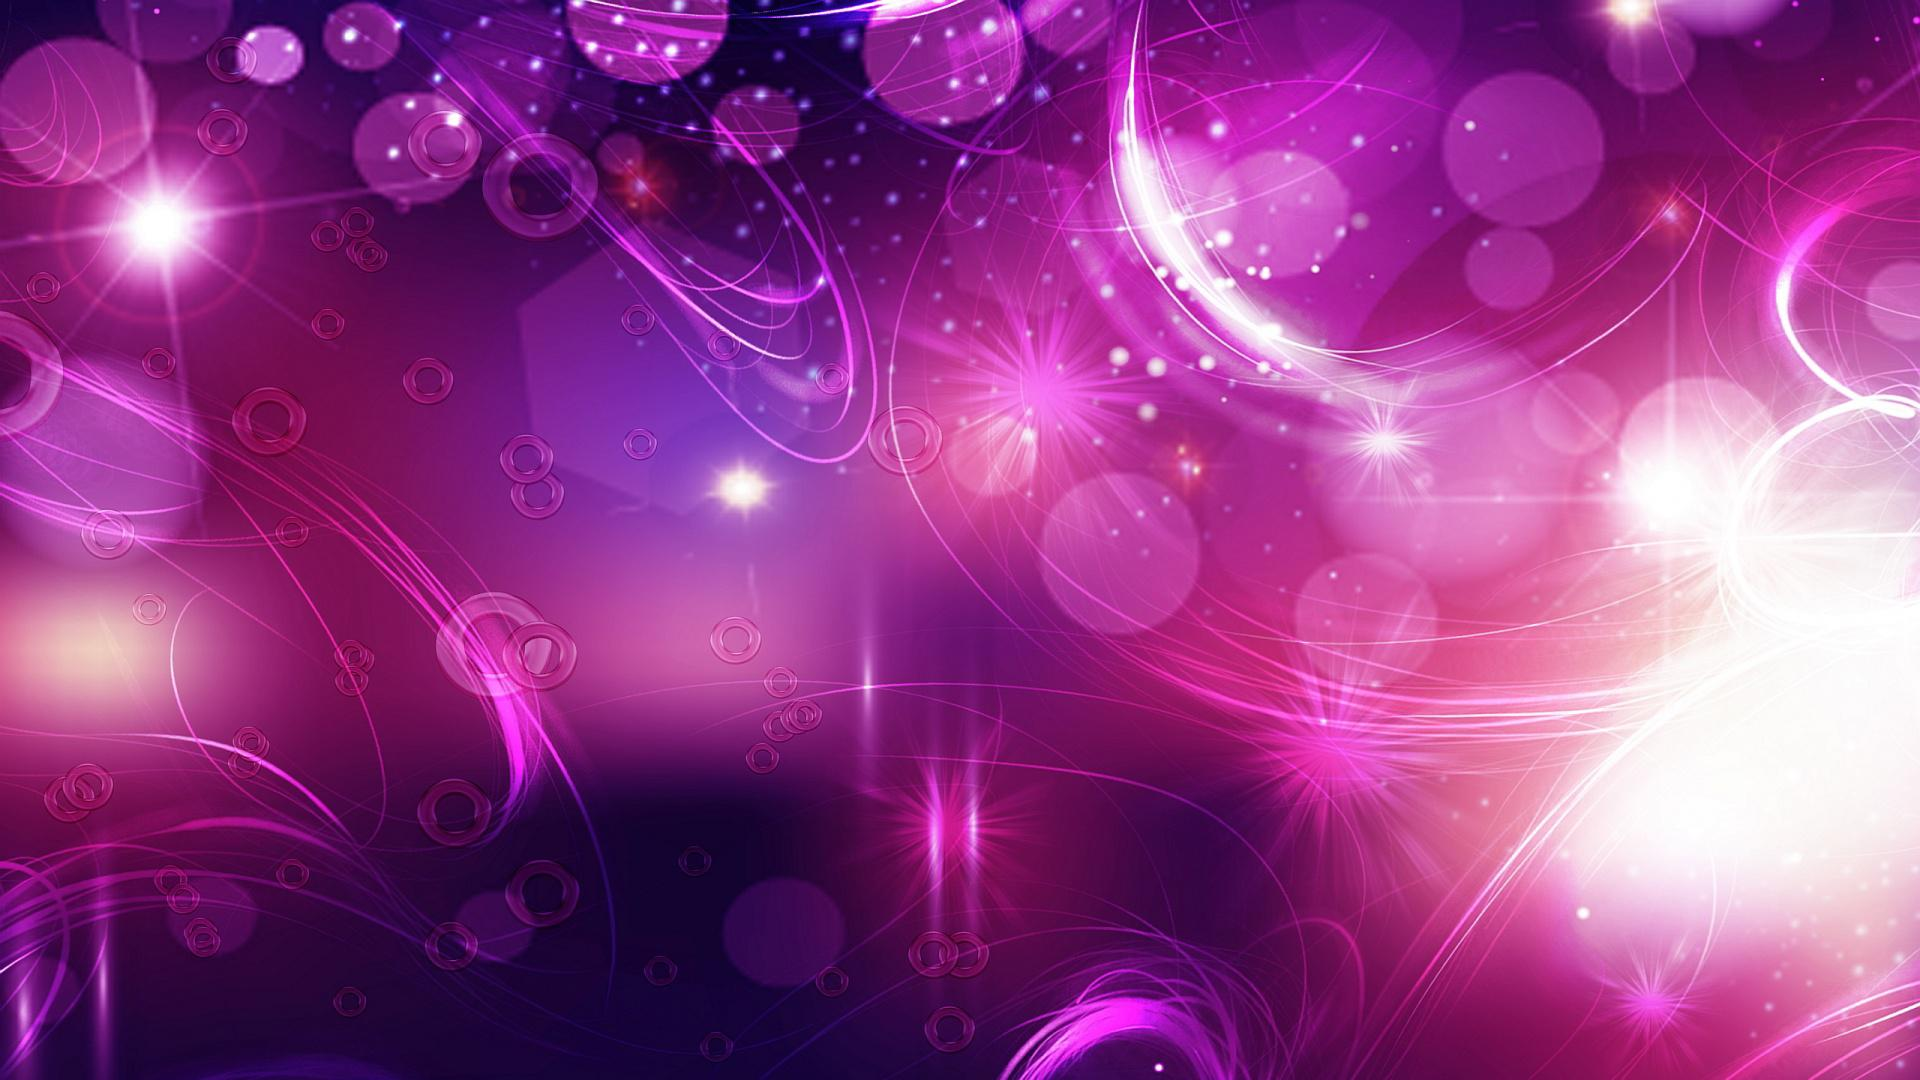 Purple Wedding Wallpaper Love Wallpaper Better